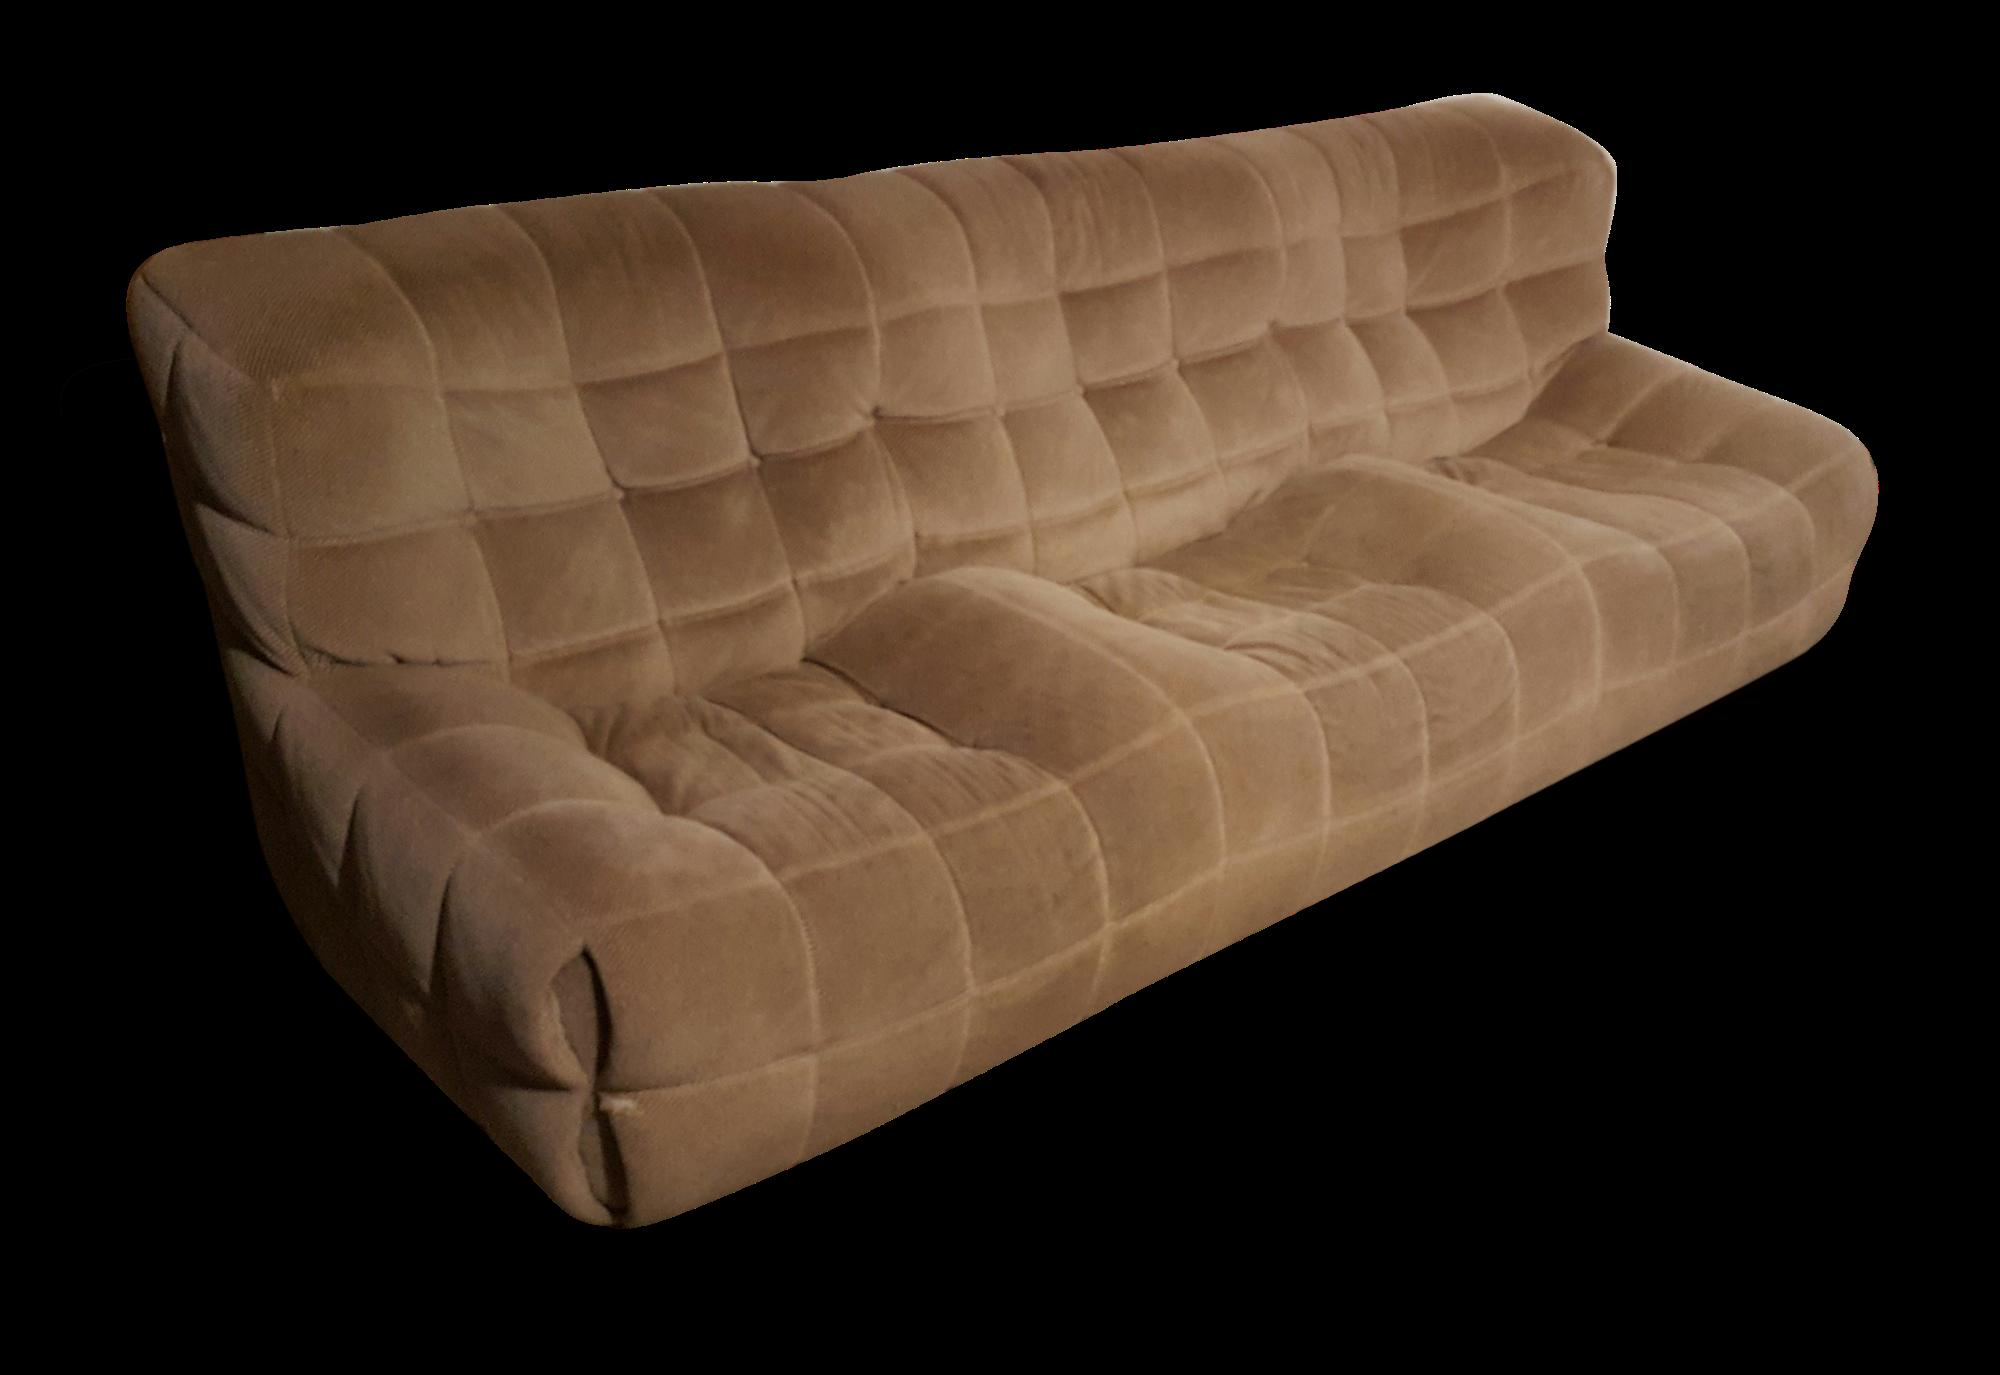 canape ligne roset solde manarola armchairs in philippe. Black Bedroom Furniture Sets. Home Design Ideas